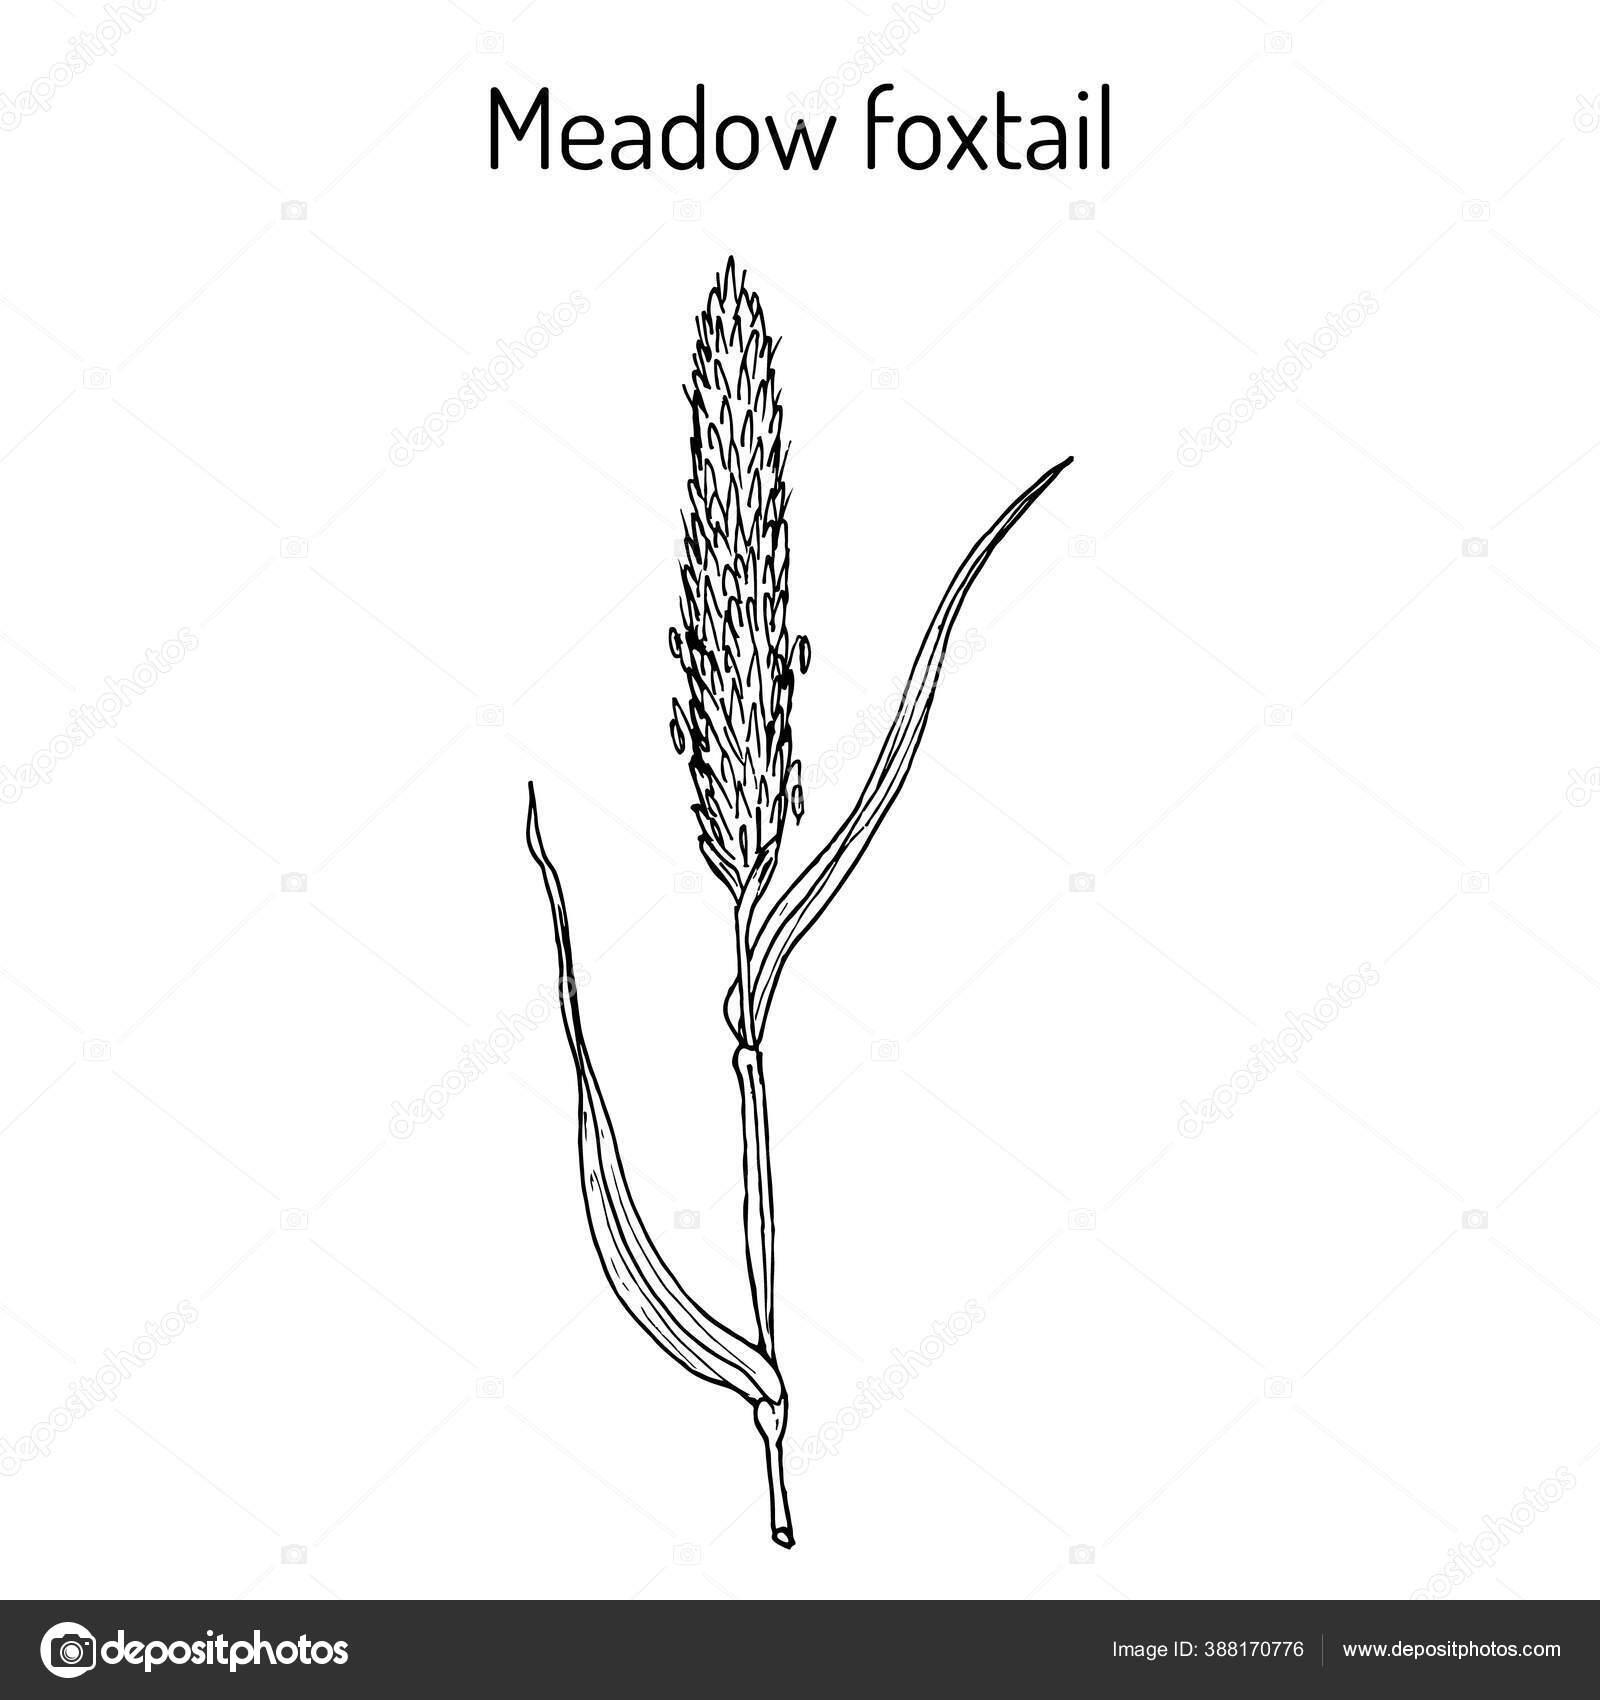 Padang Rumput Foxtail Alopecurus Pratensis Tanaman Obat Stok Vektor C Foxyliam 388170776